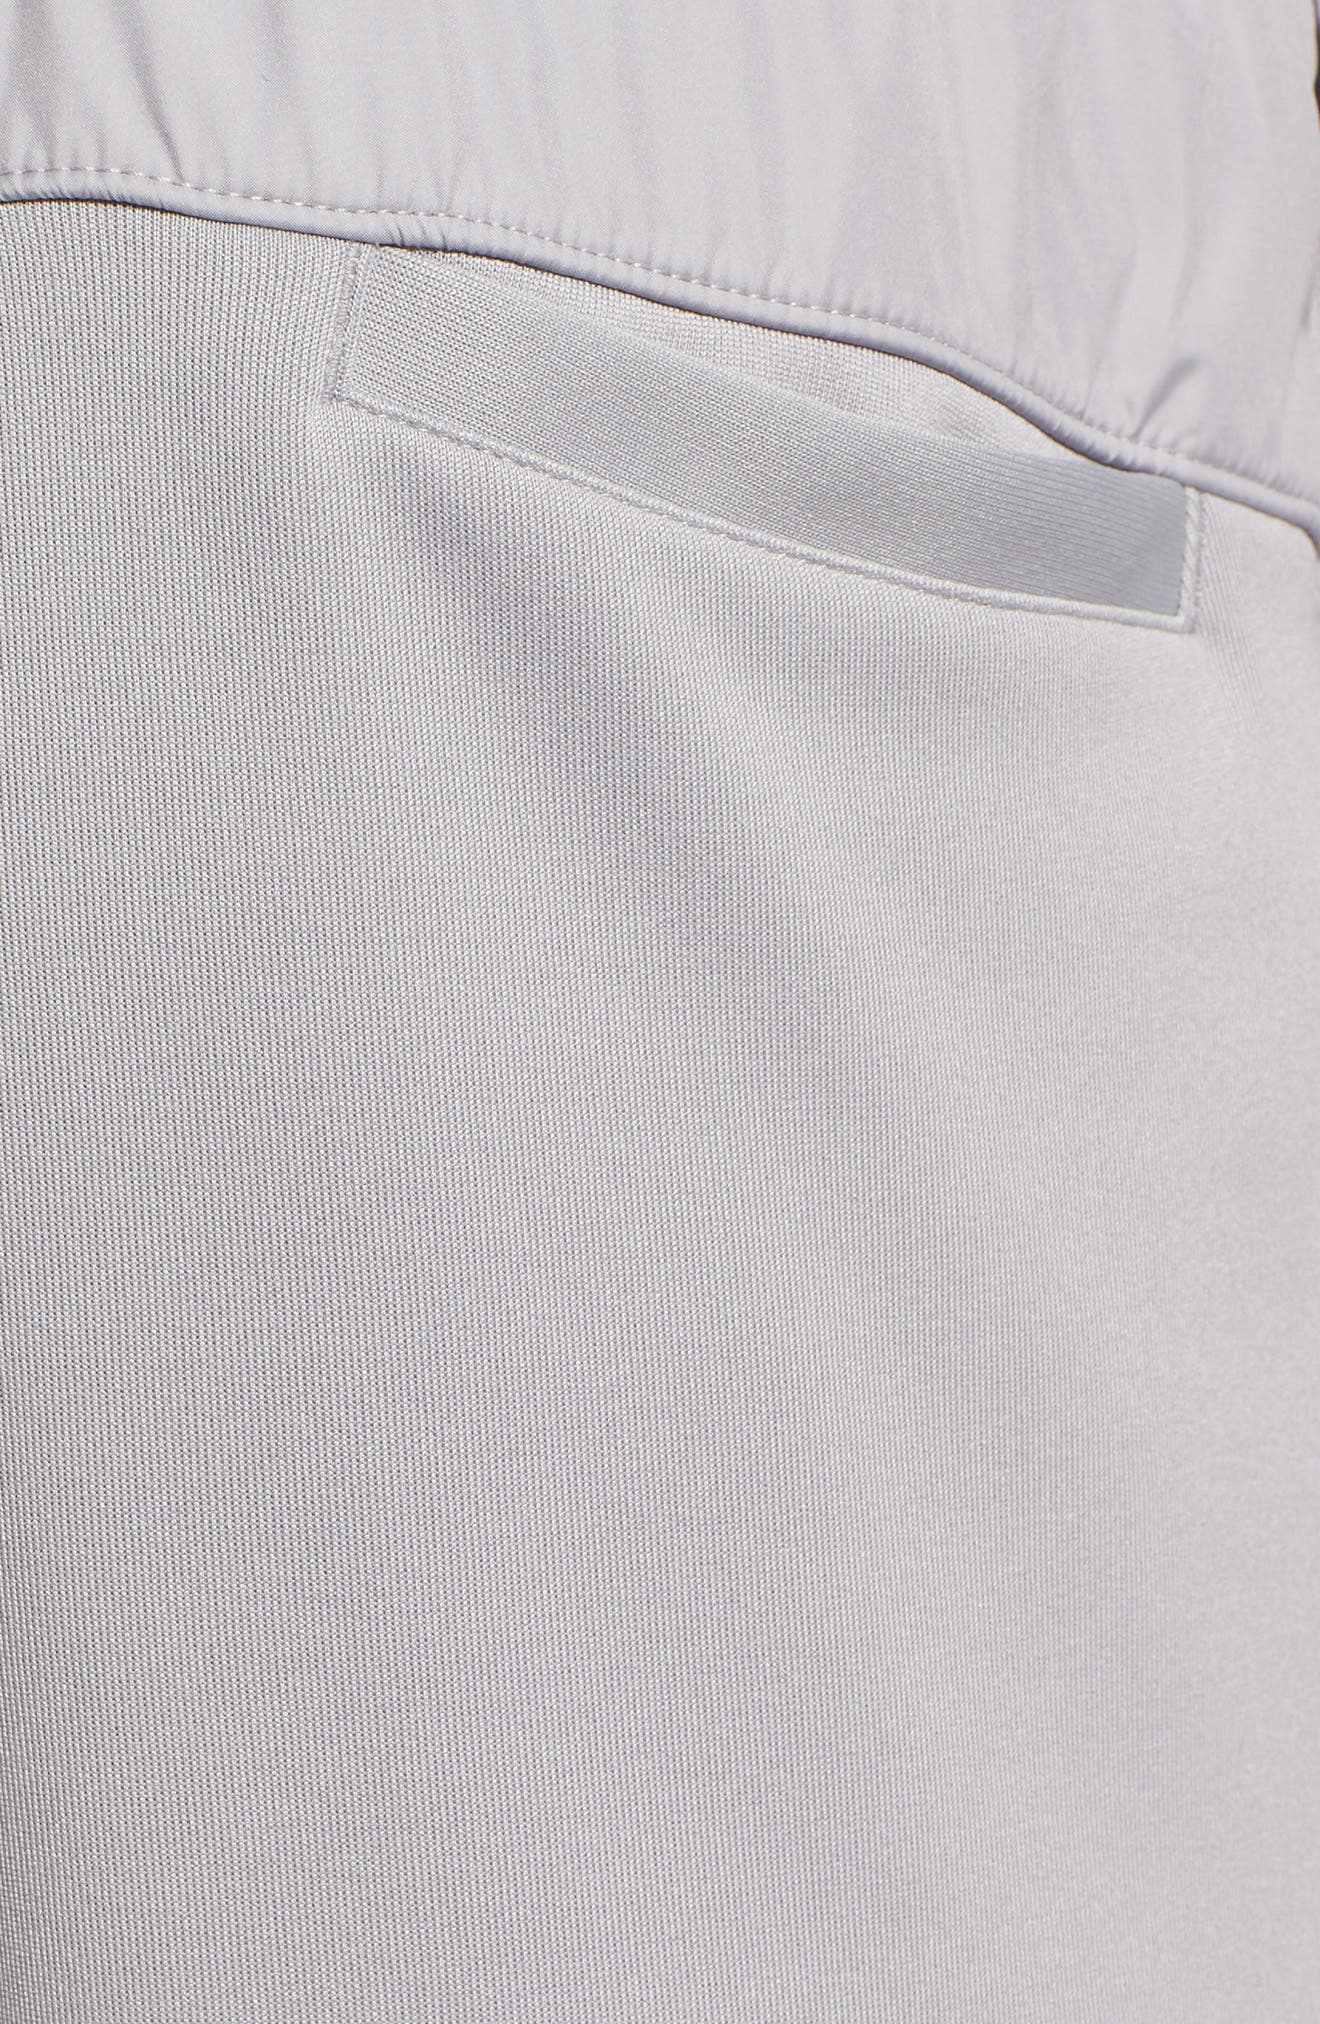 Sportswear Air Max Shorts,                             Alternate thumbnail 10, color,